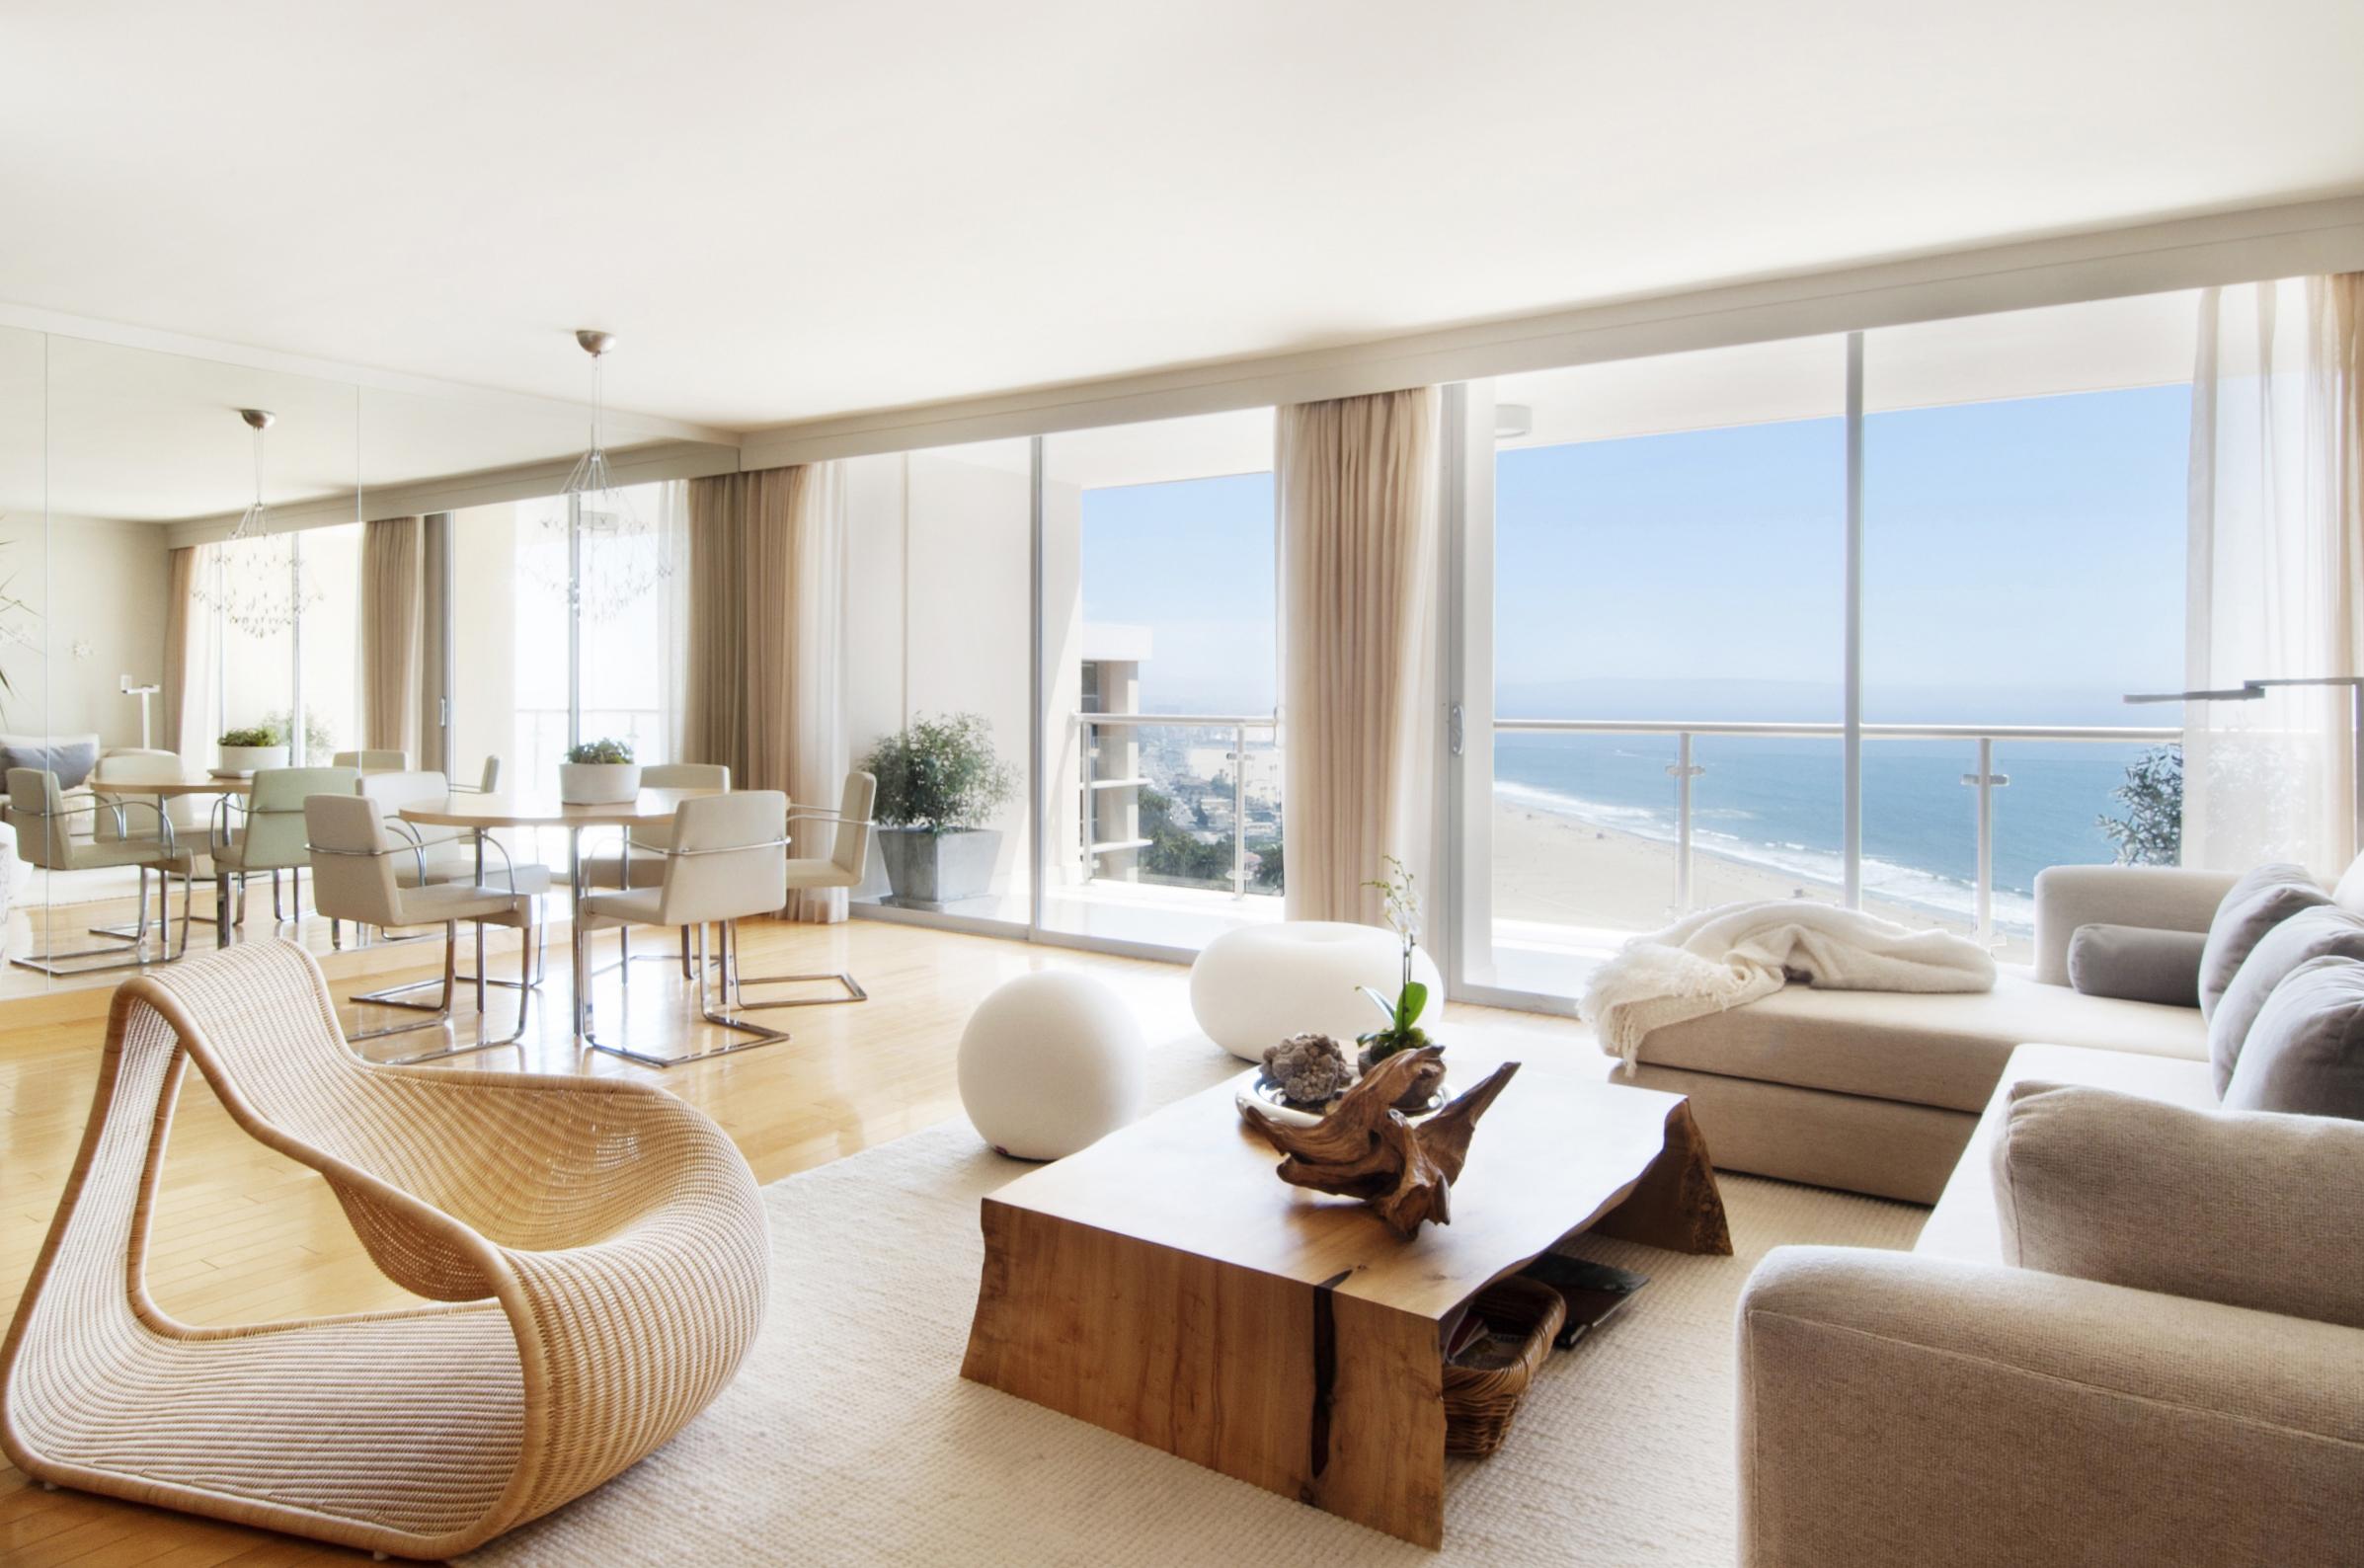 sarah-barnard-design-ocean-avenue-penthouse-01.jpg